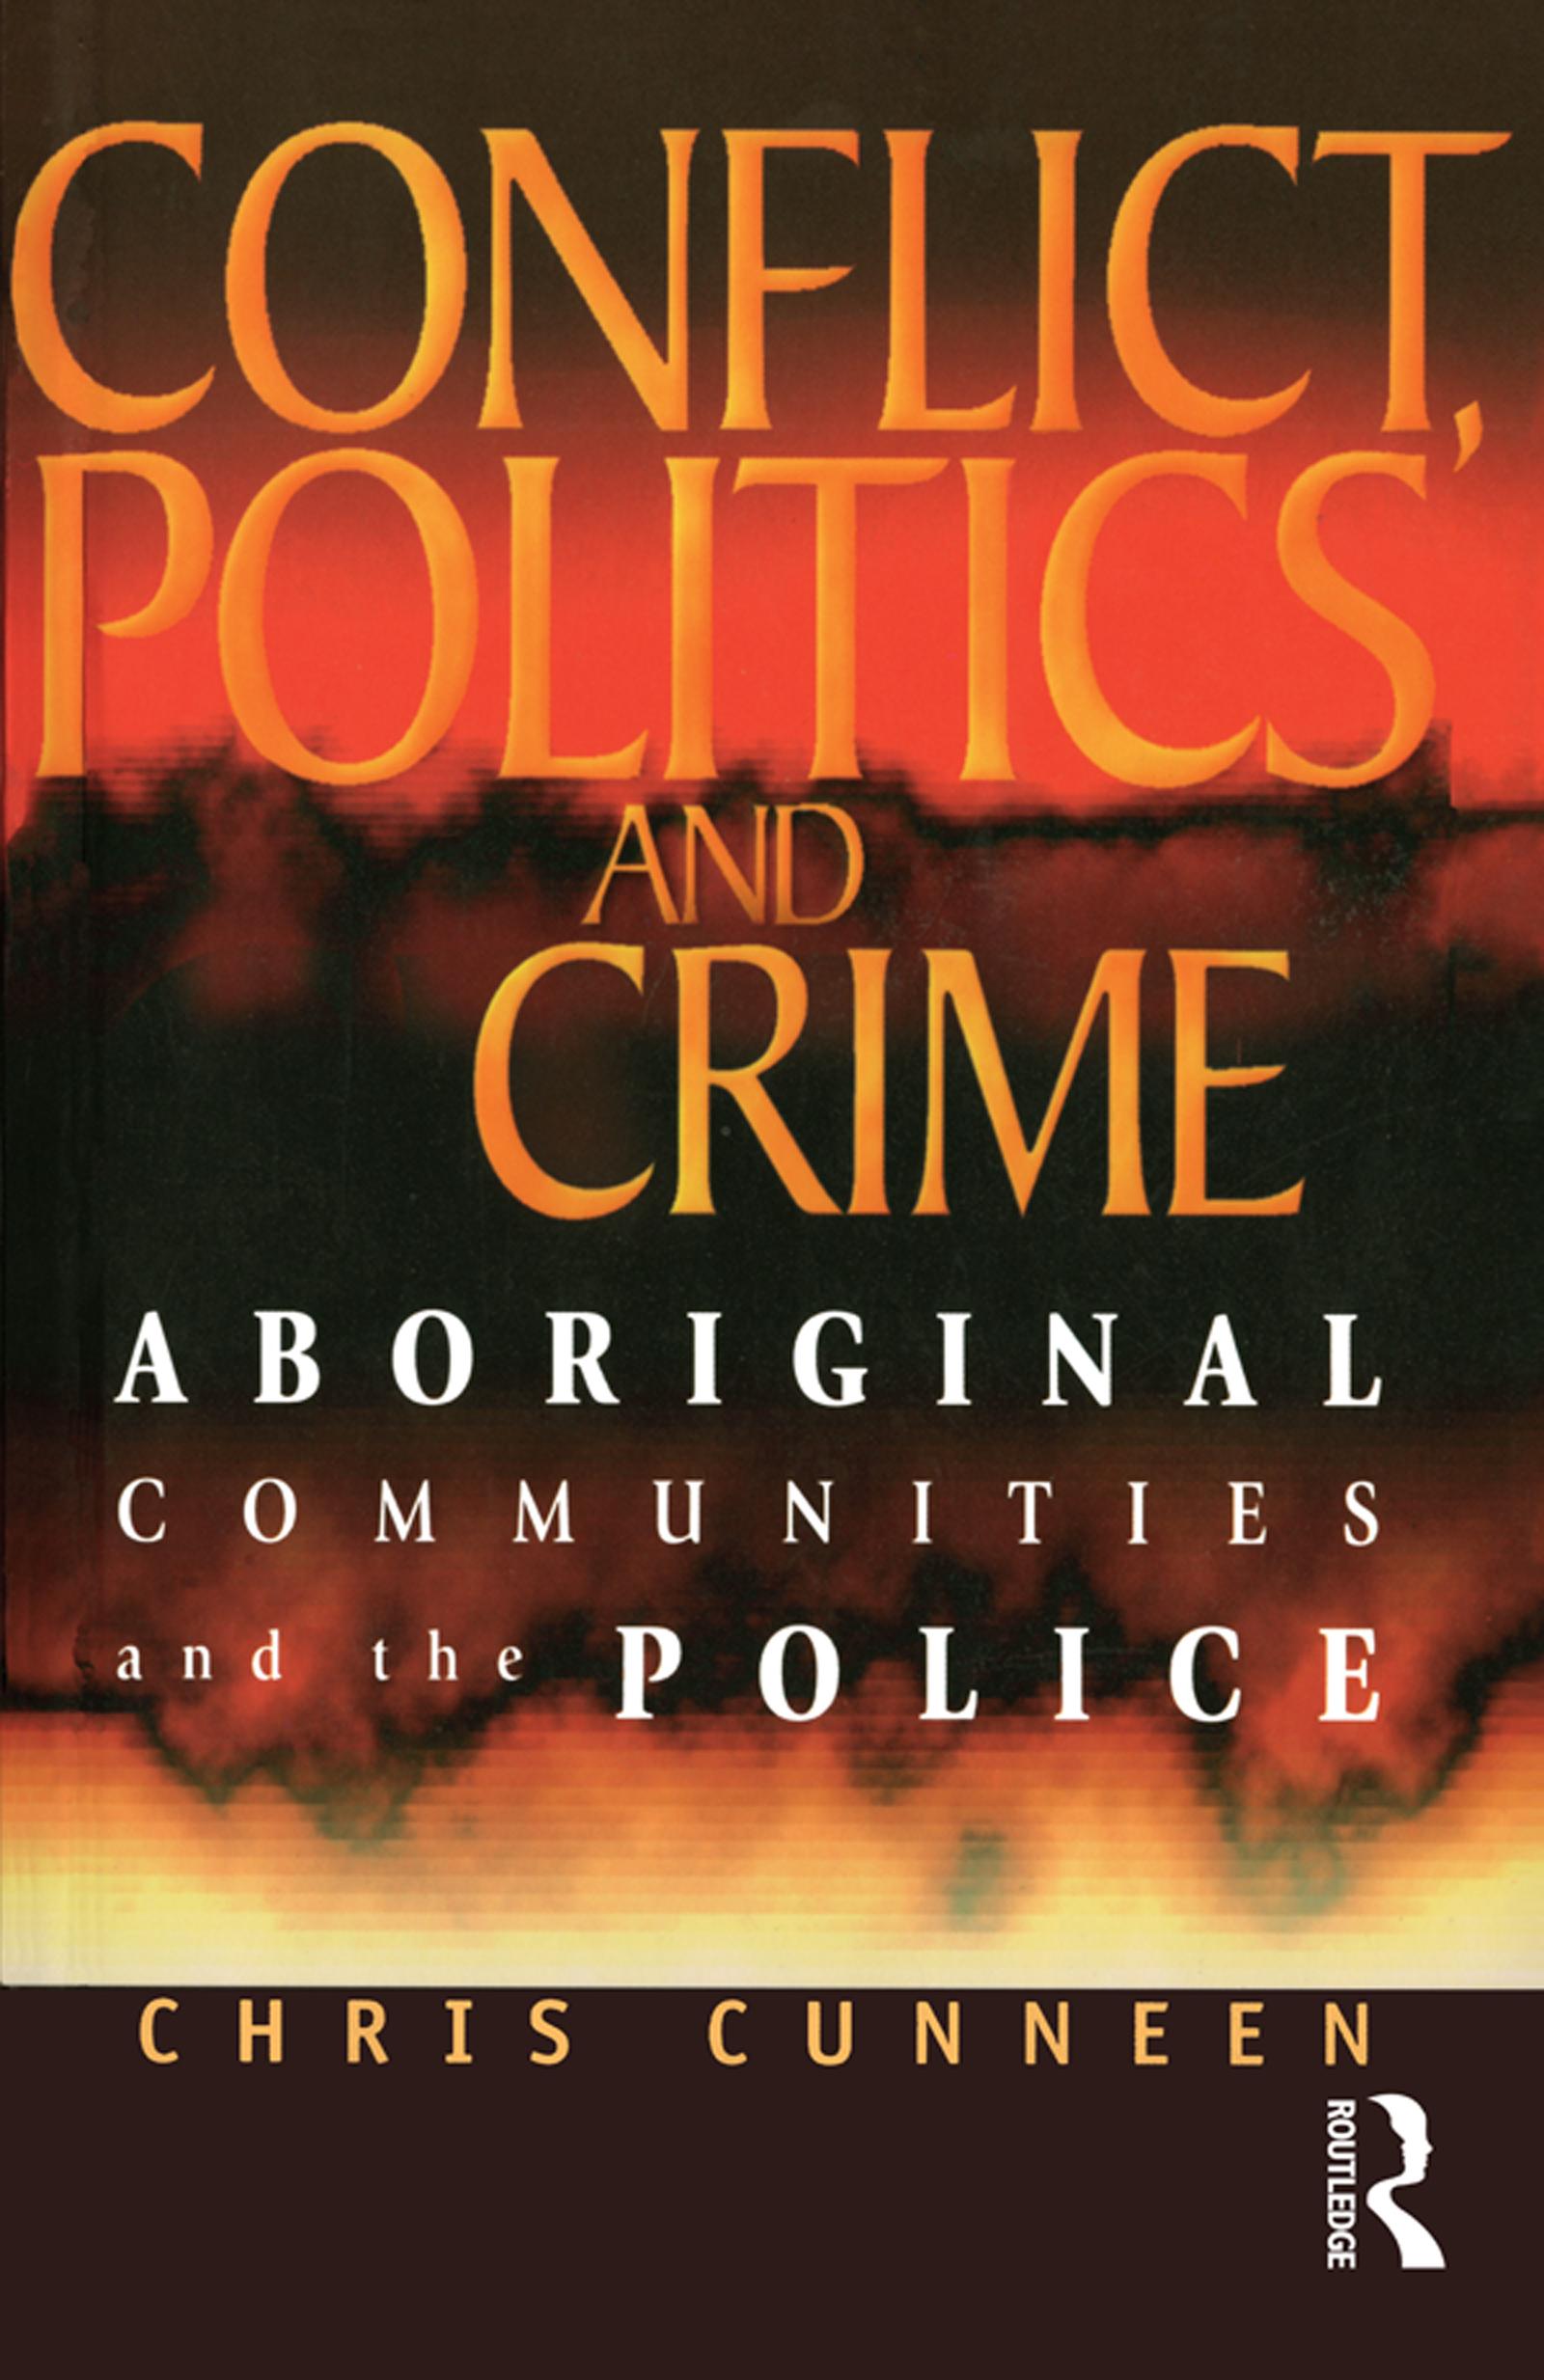 Conflict, Politics and Crime